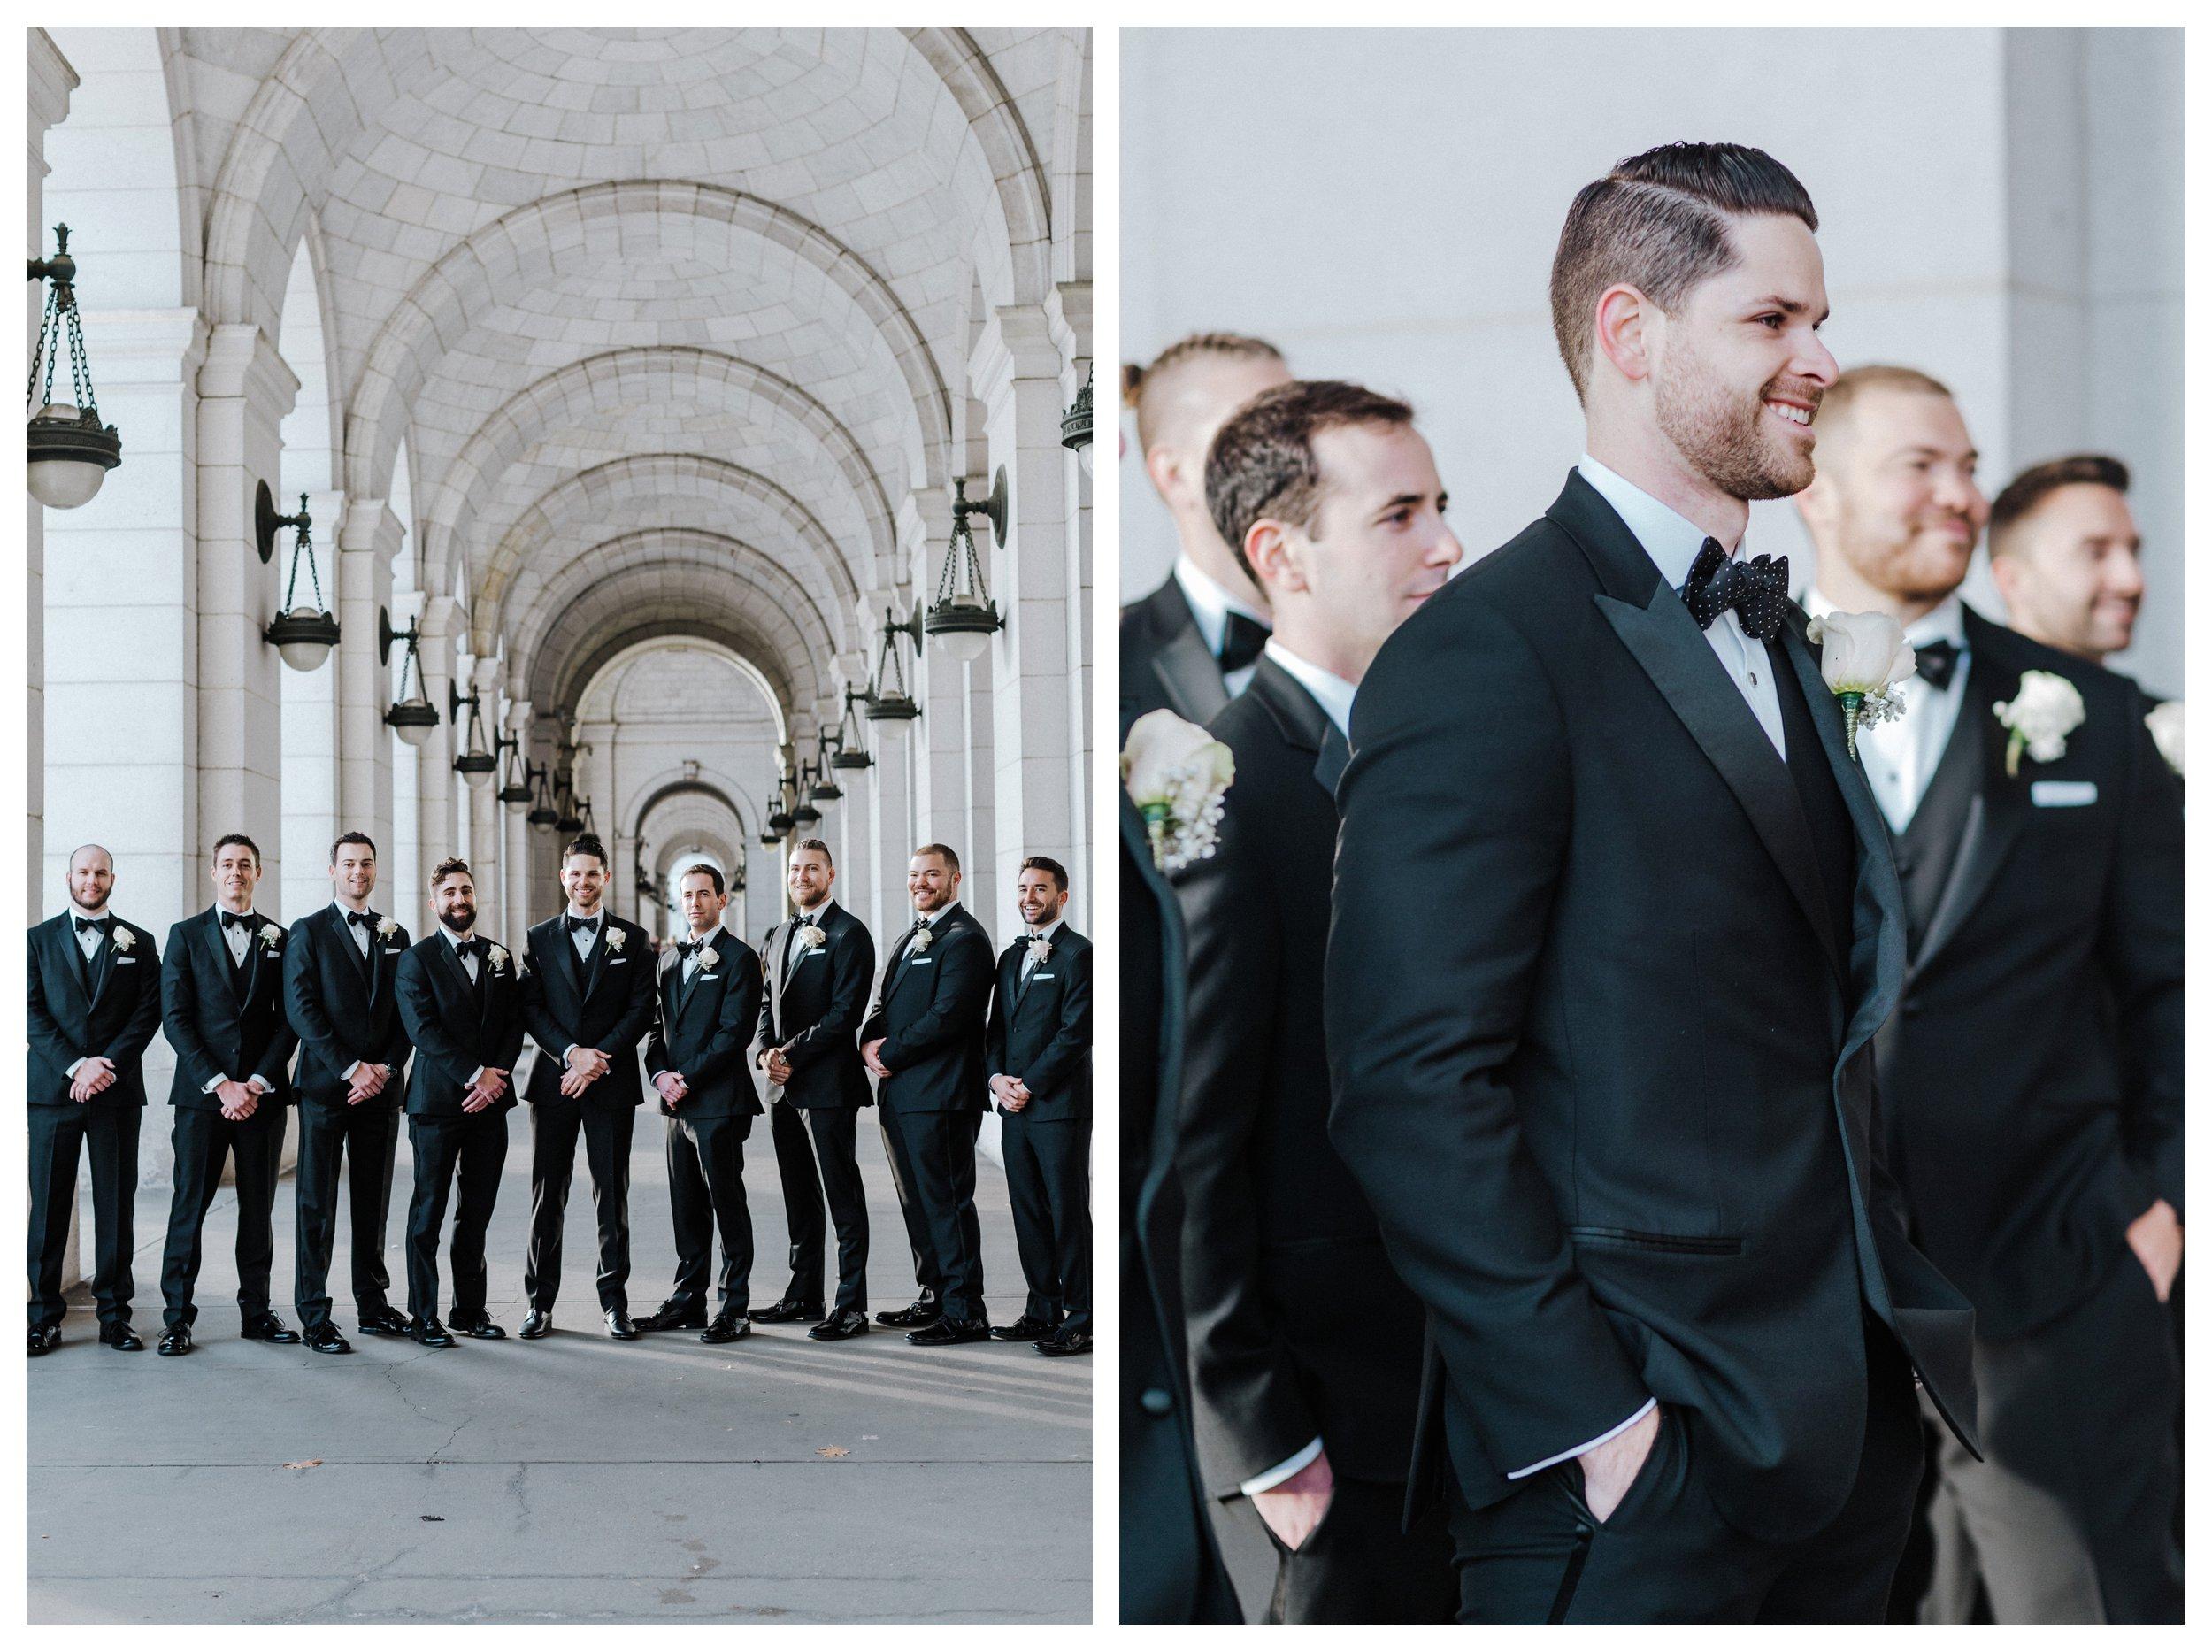 washington-dc-wedding-photographer-25.JPG